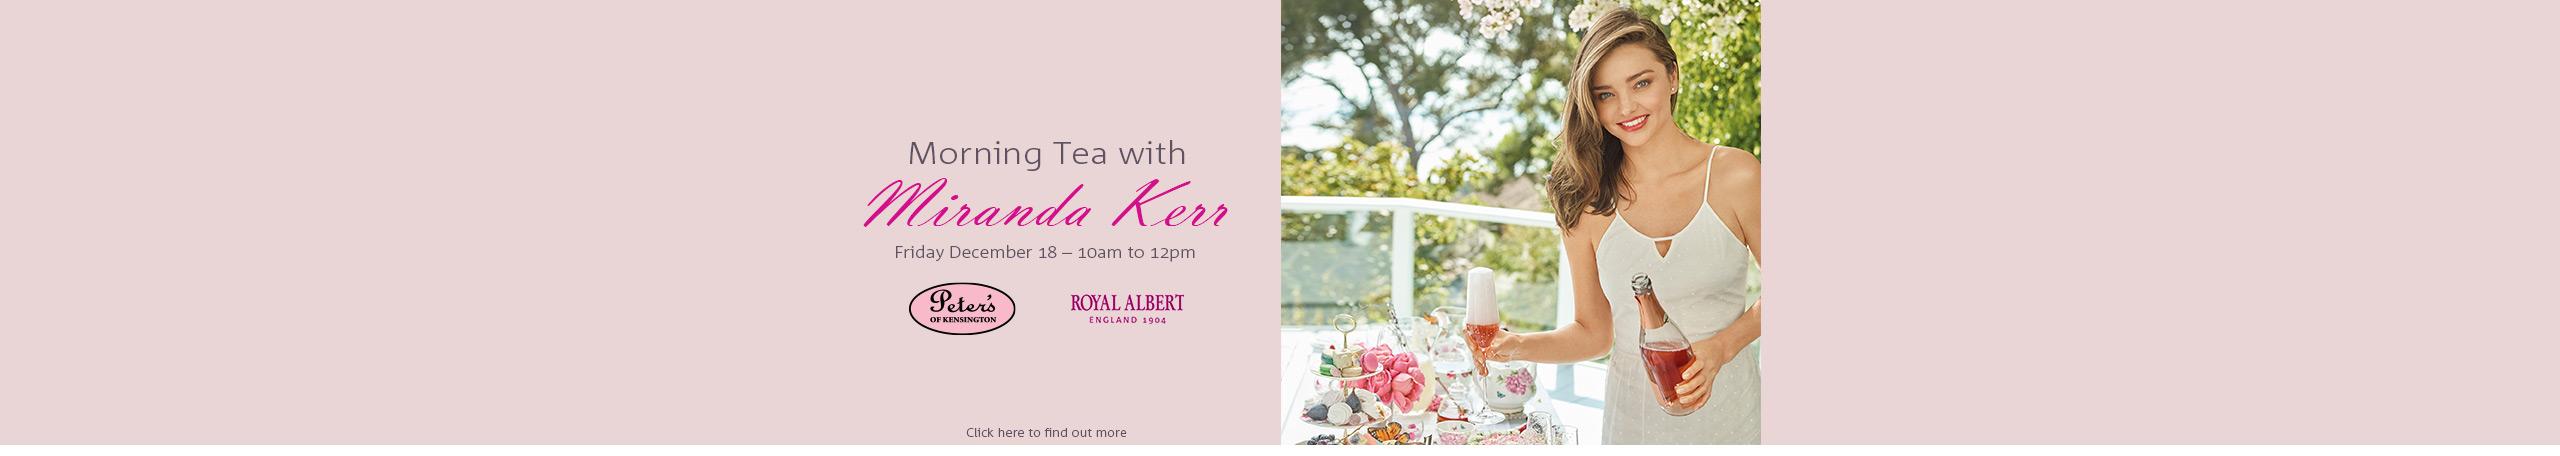 Morning Tea with Miranda Kerr